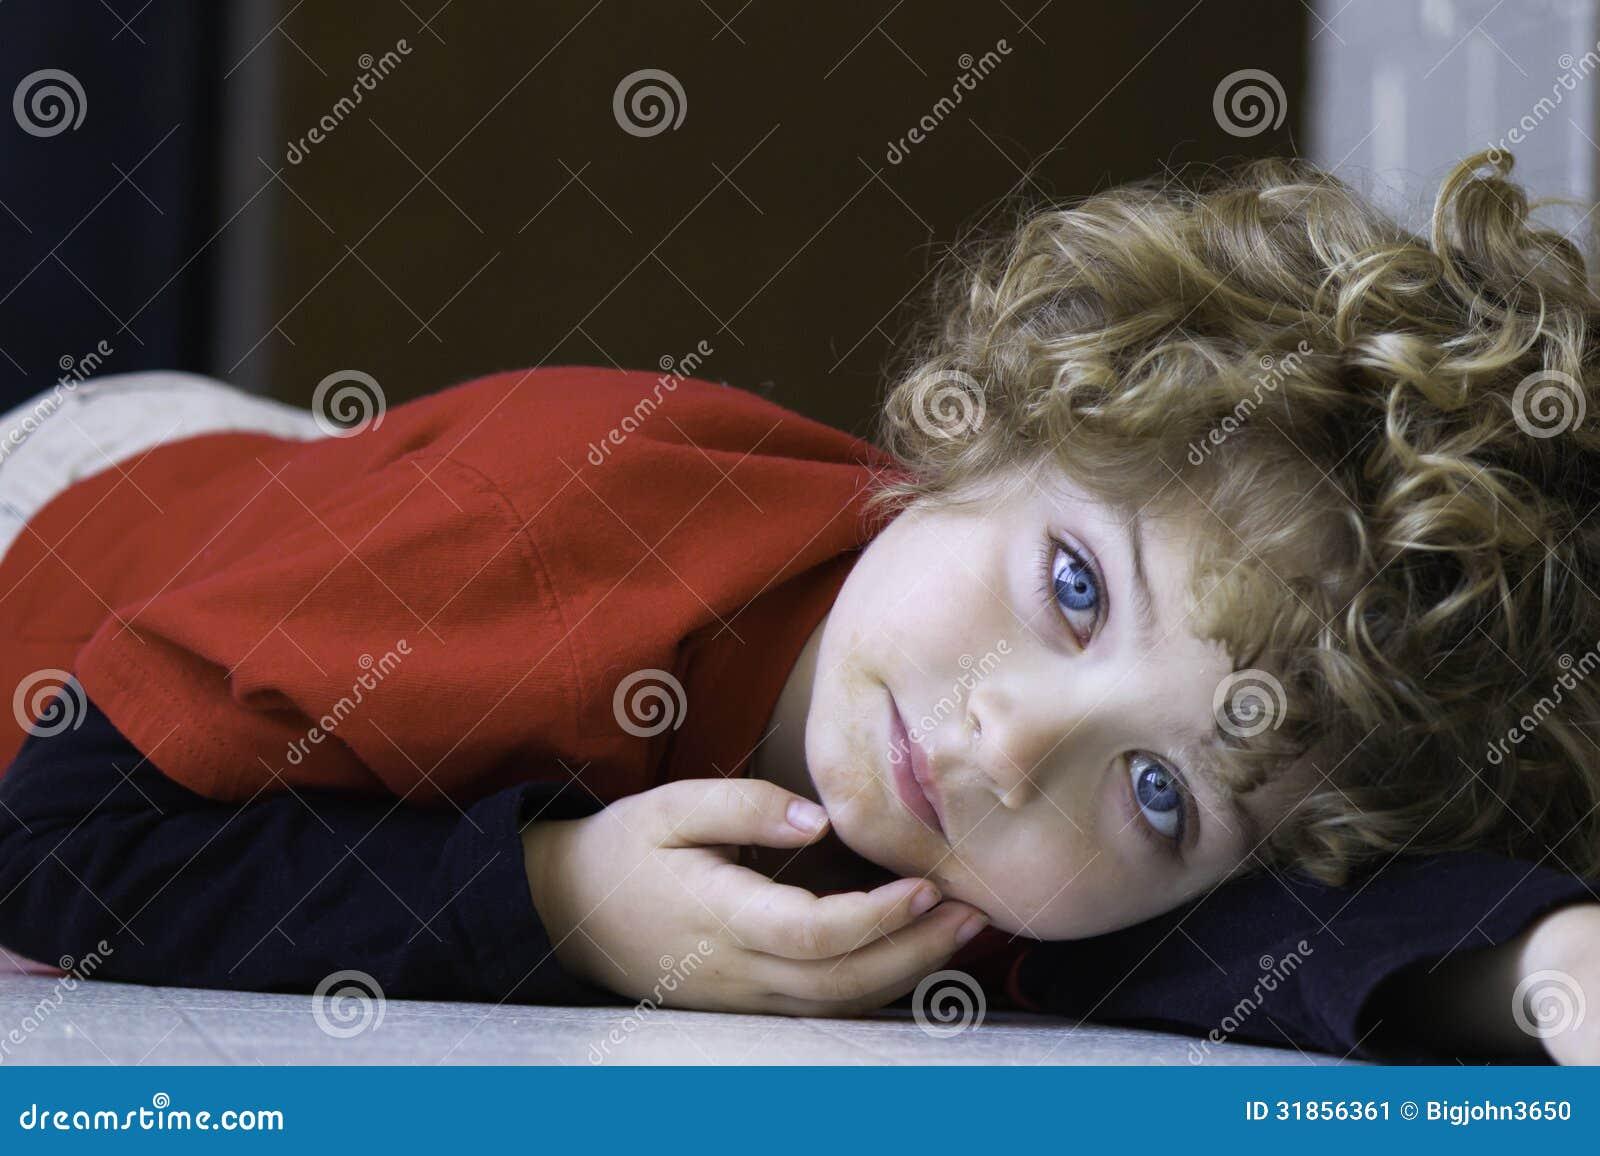 Hair Photos Boy Download: Beautiful Young Boy Stock Photos